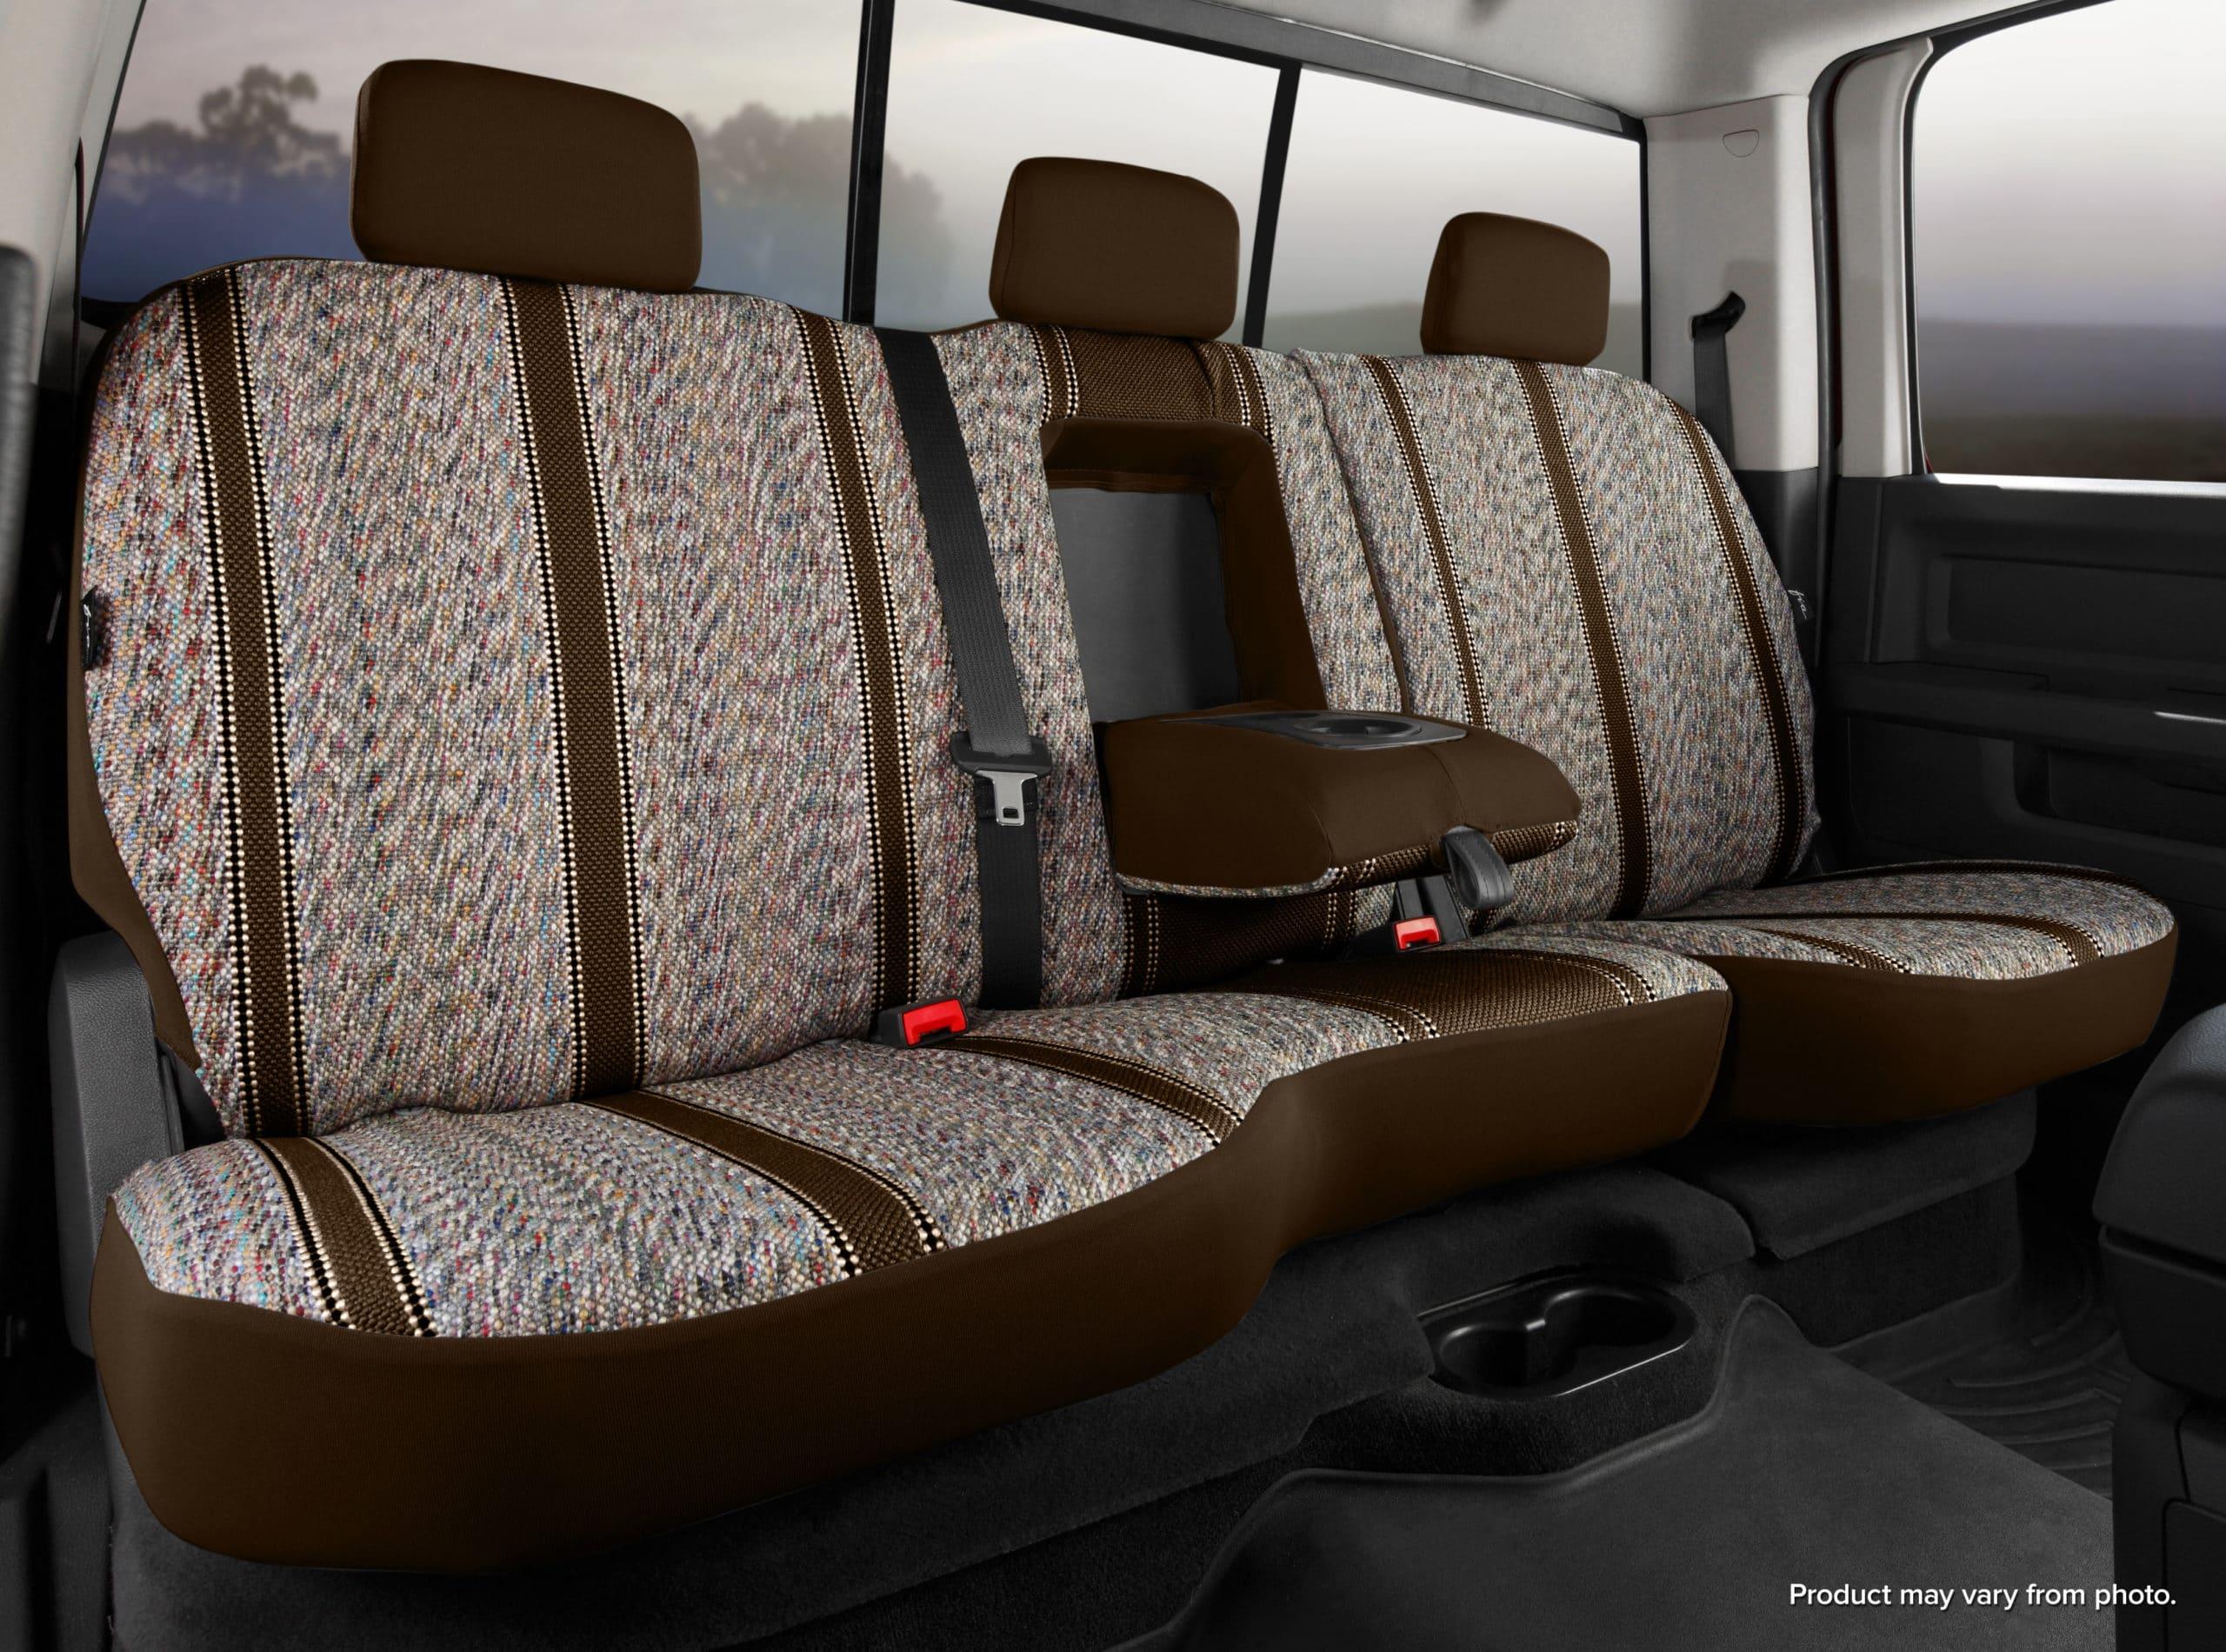 Fia Original Wrangler Seat Covers - Brown - Rear Seats